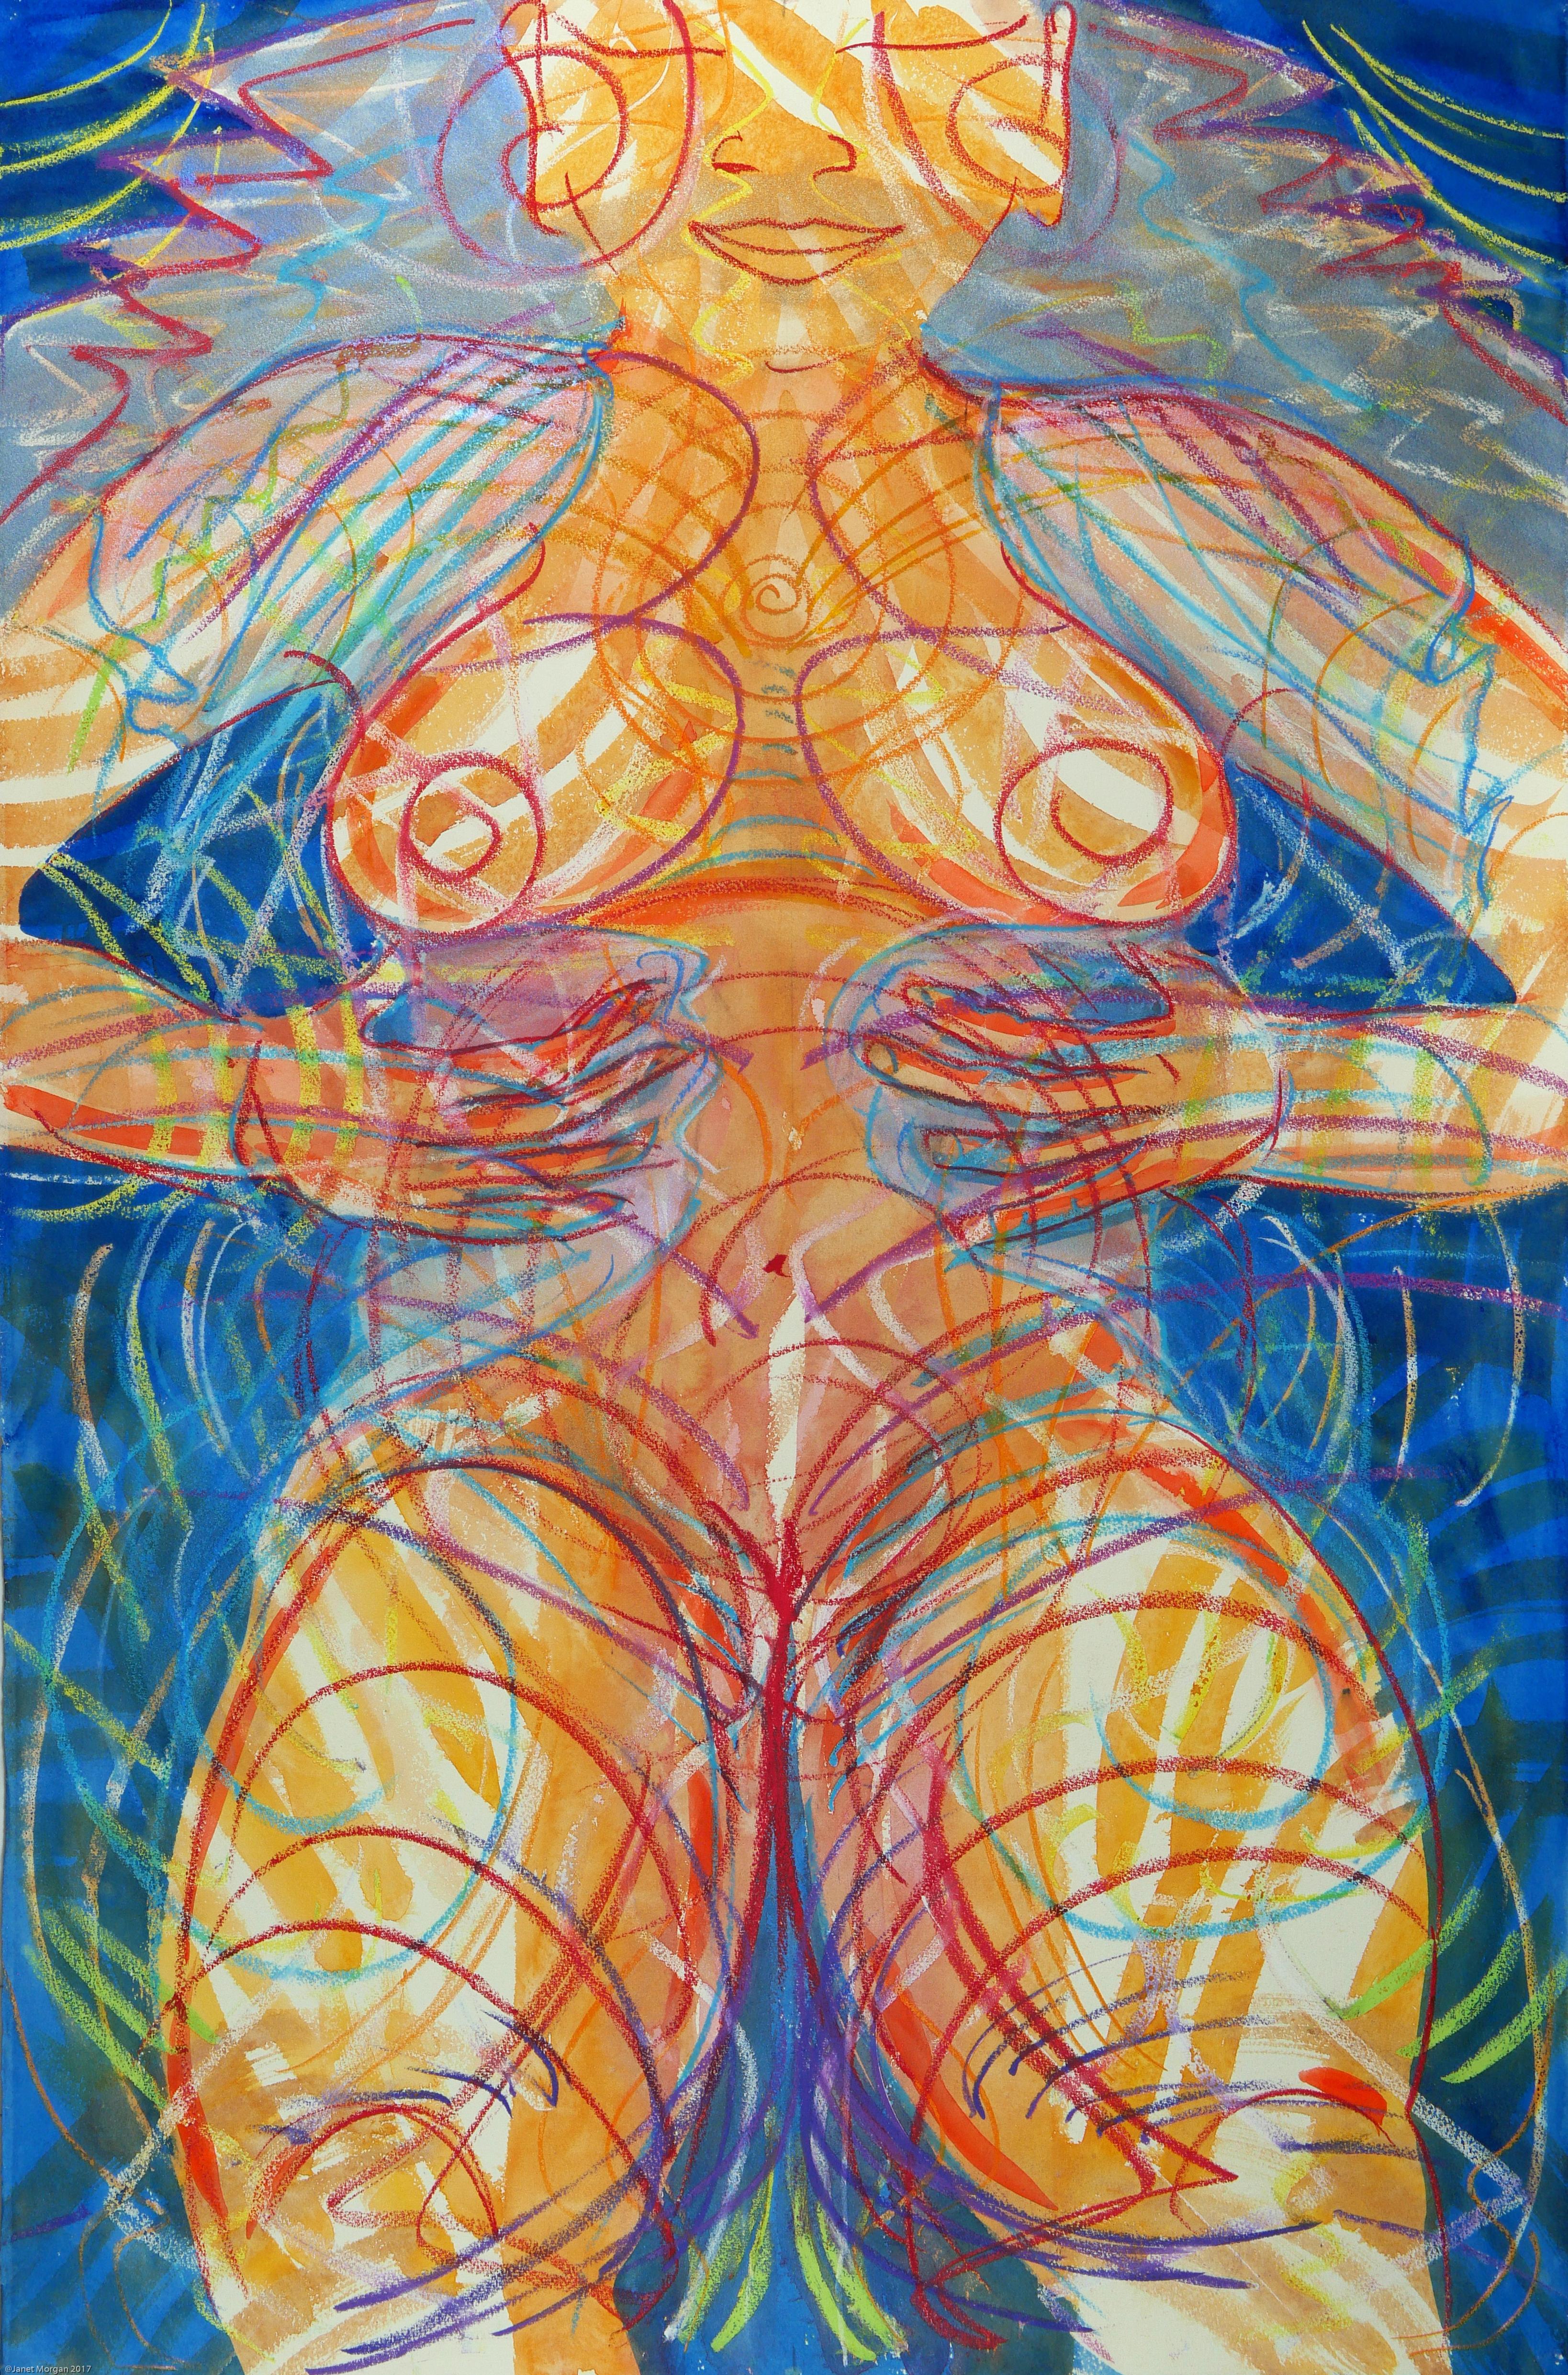 UmmHummm, colorful spiritual energetic mystical figure